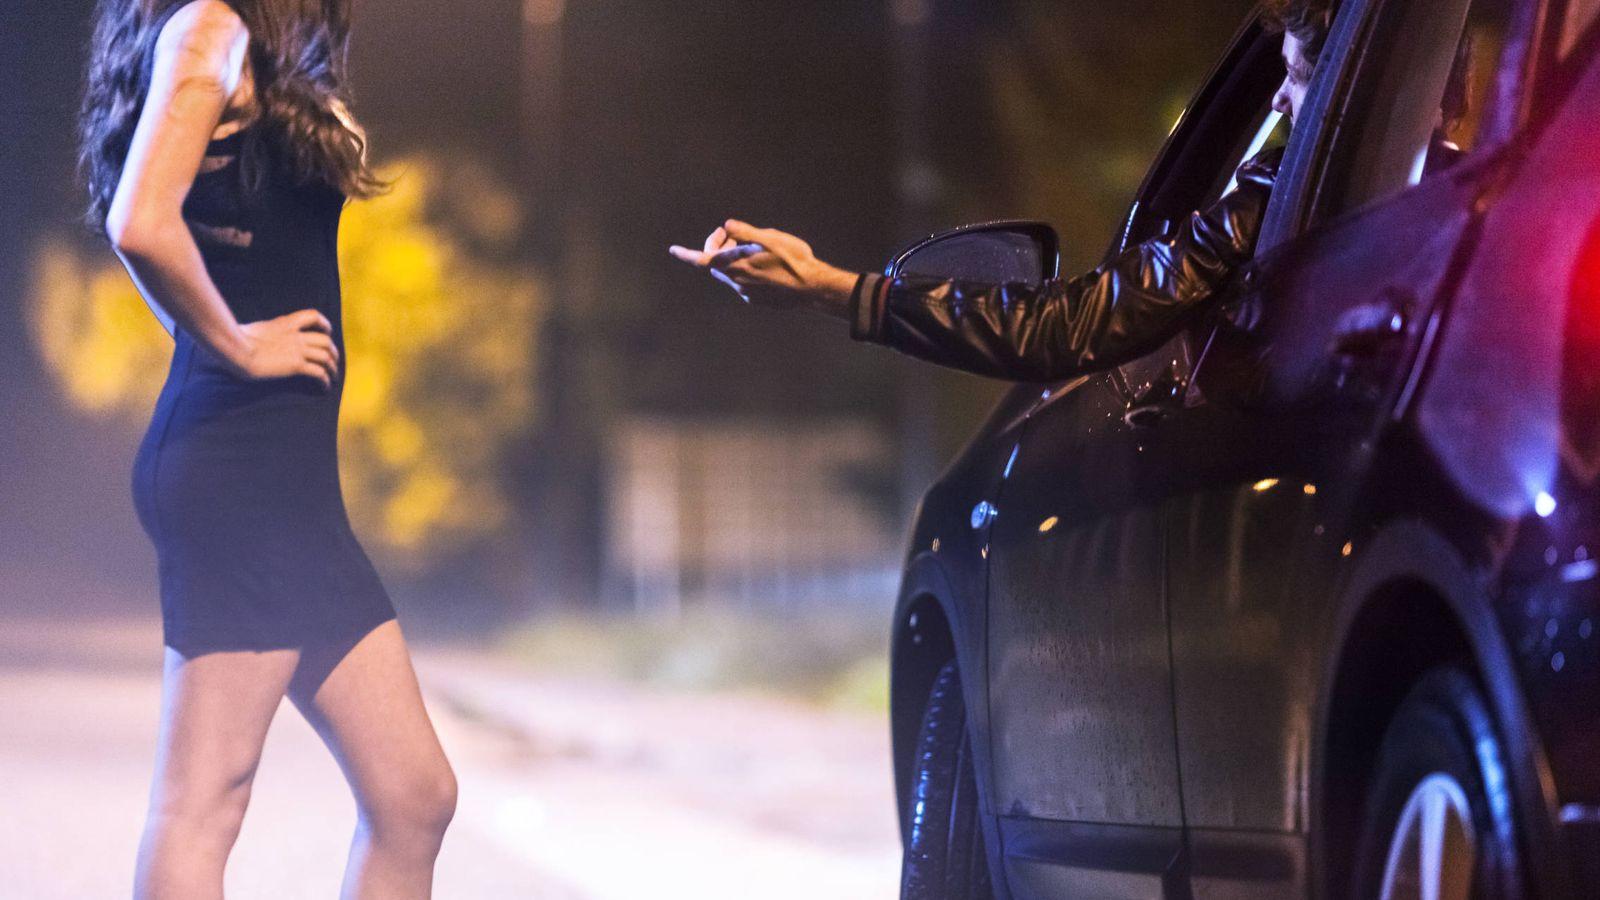 Prostitutas en vecindario prostitutas en hoteles